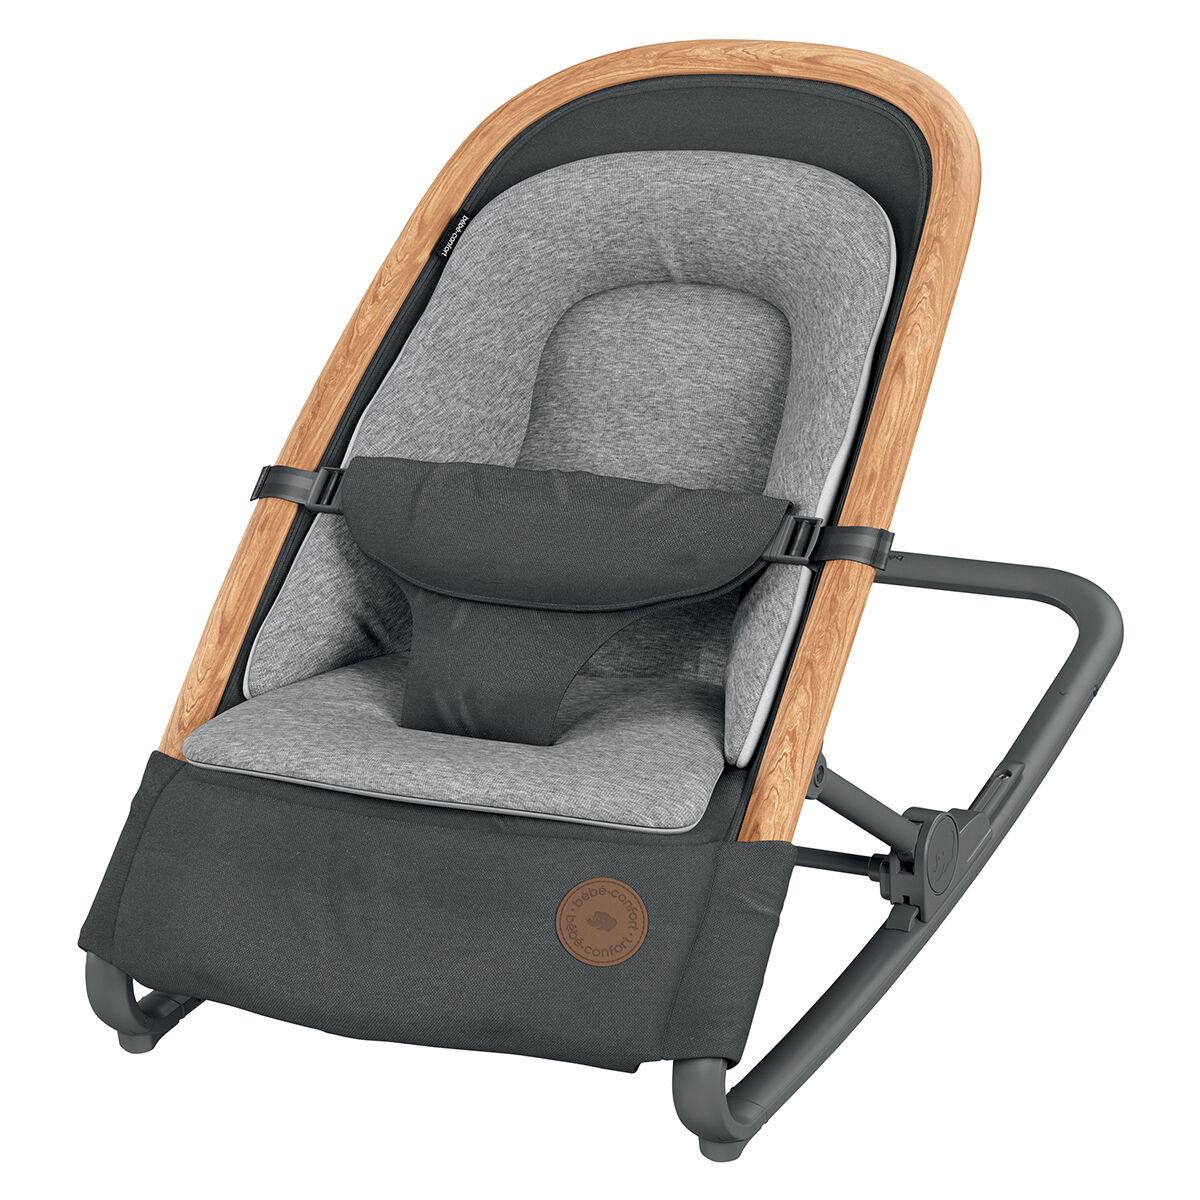 Bébé Confort Transat Kori - Essential Graphite